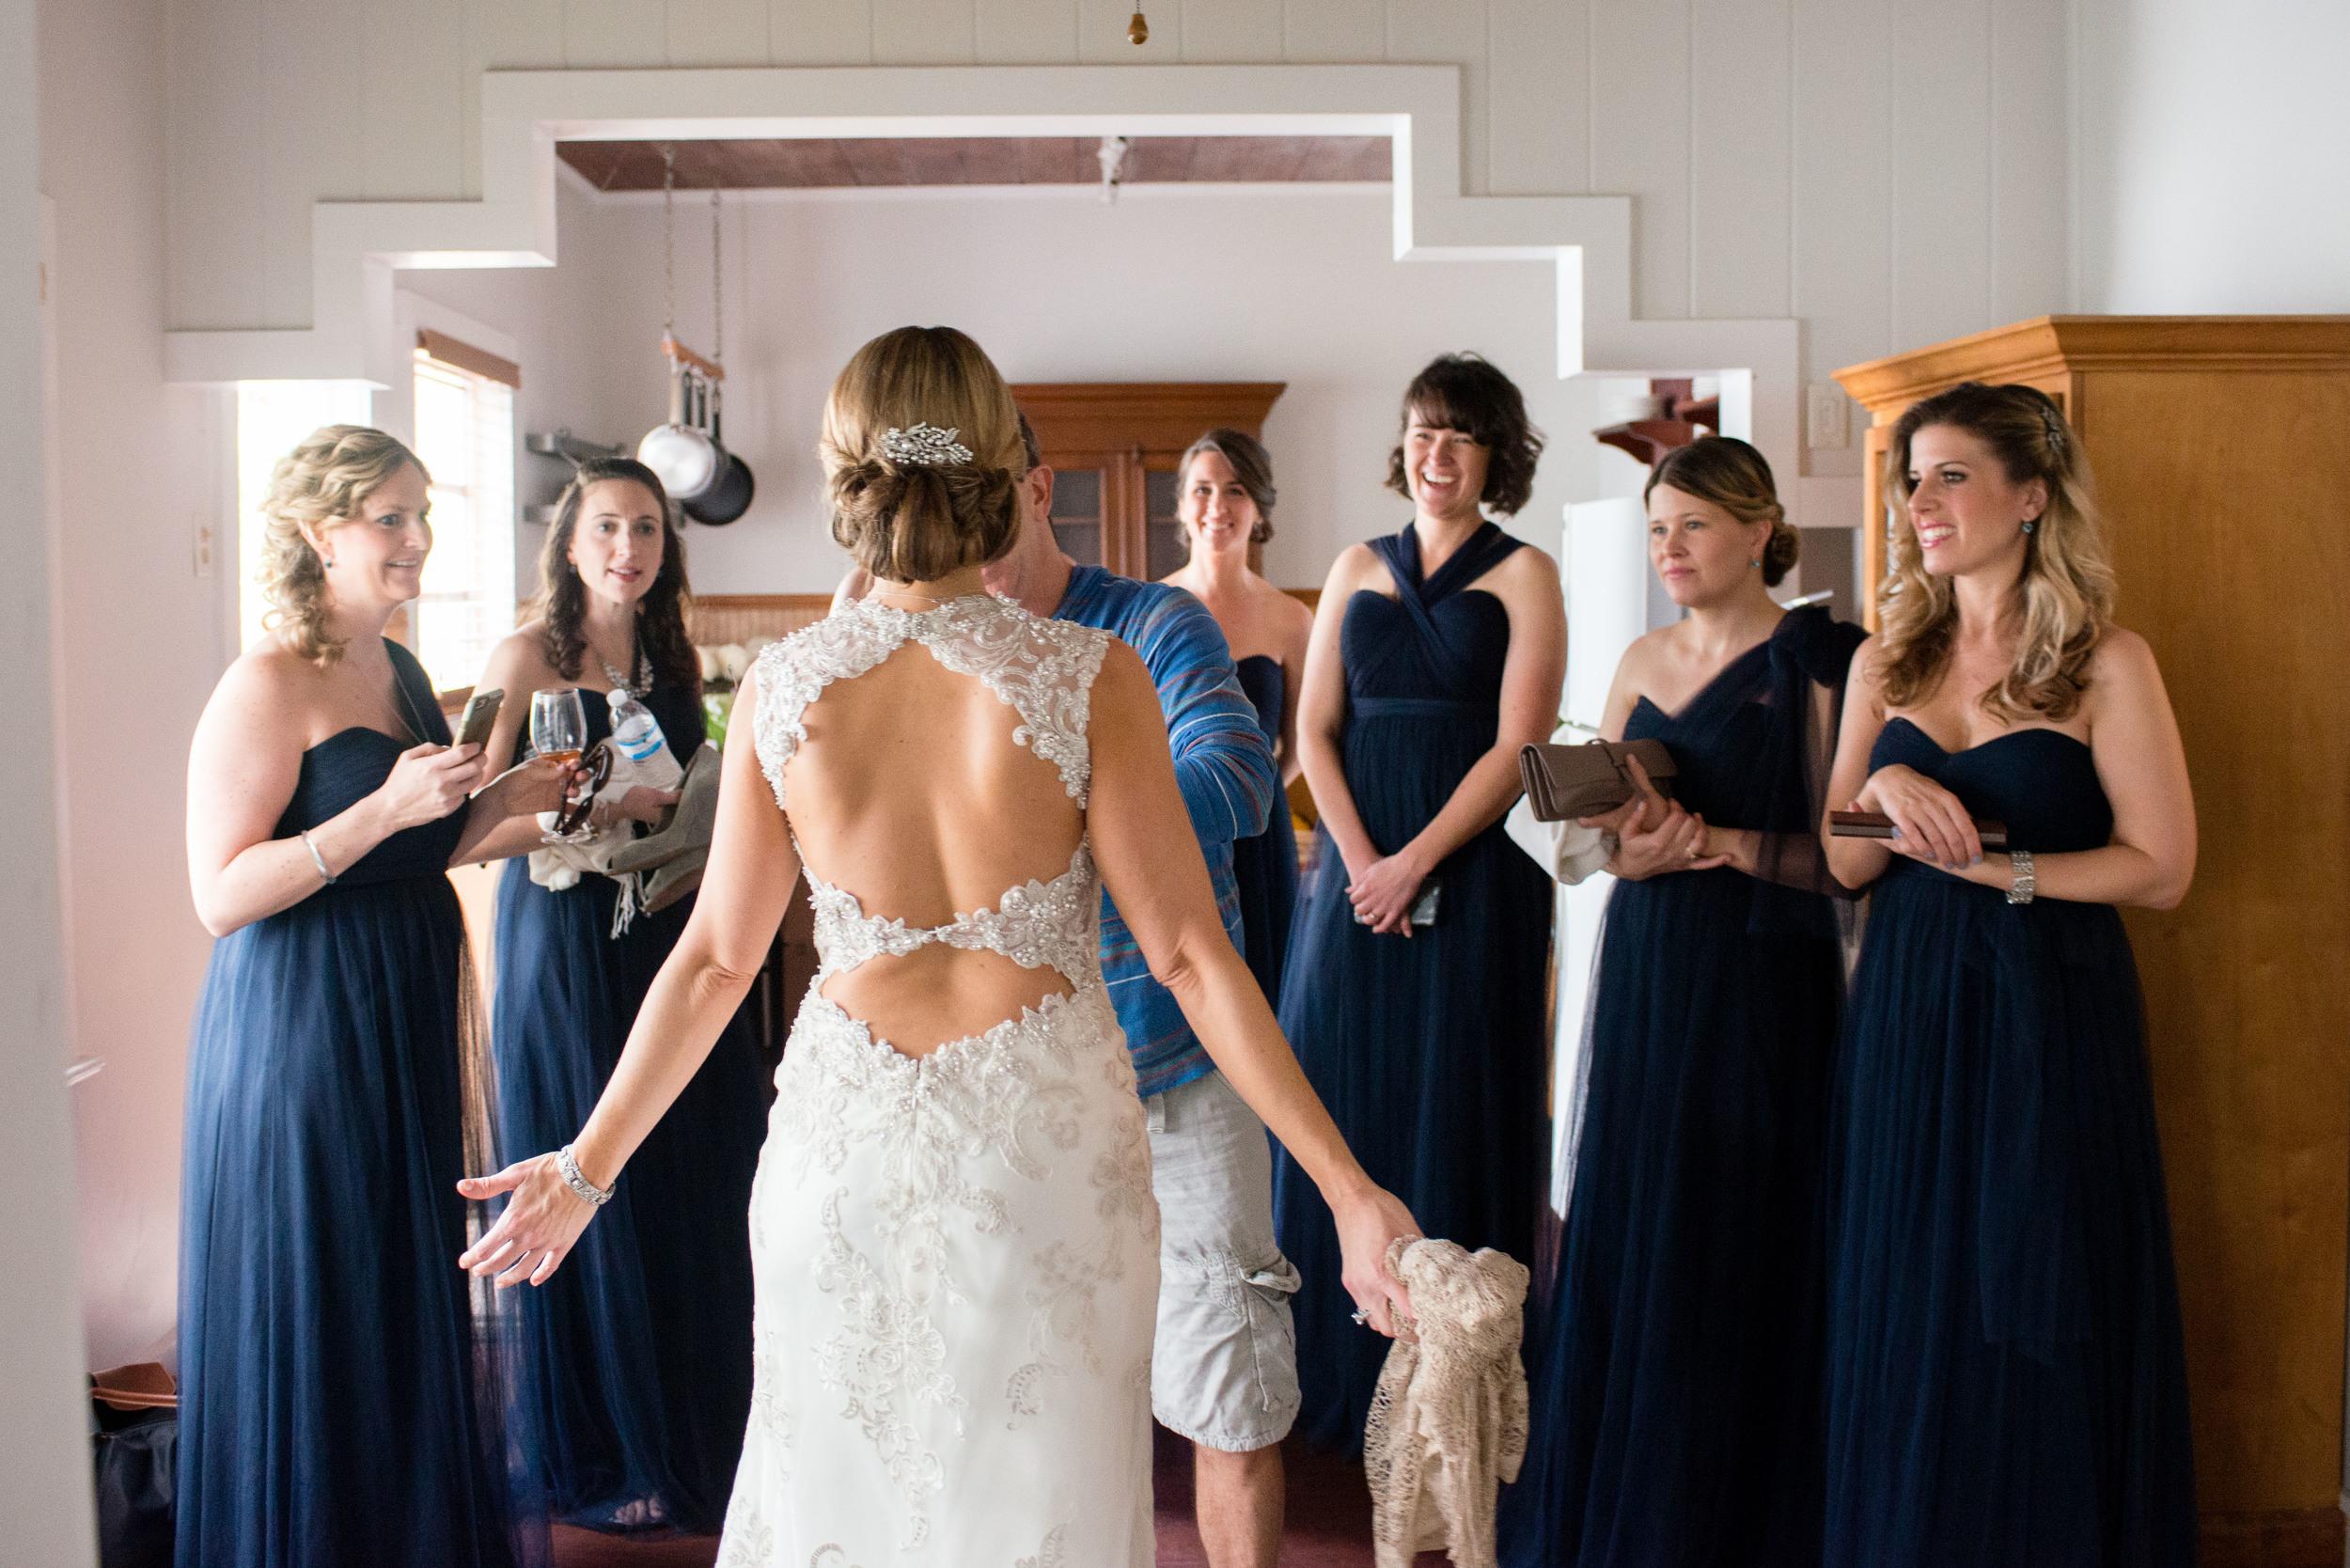 ocean-key-resort-key-west-wedding-010.jpg